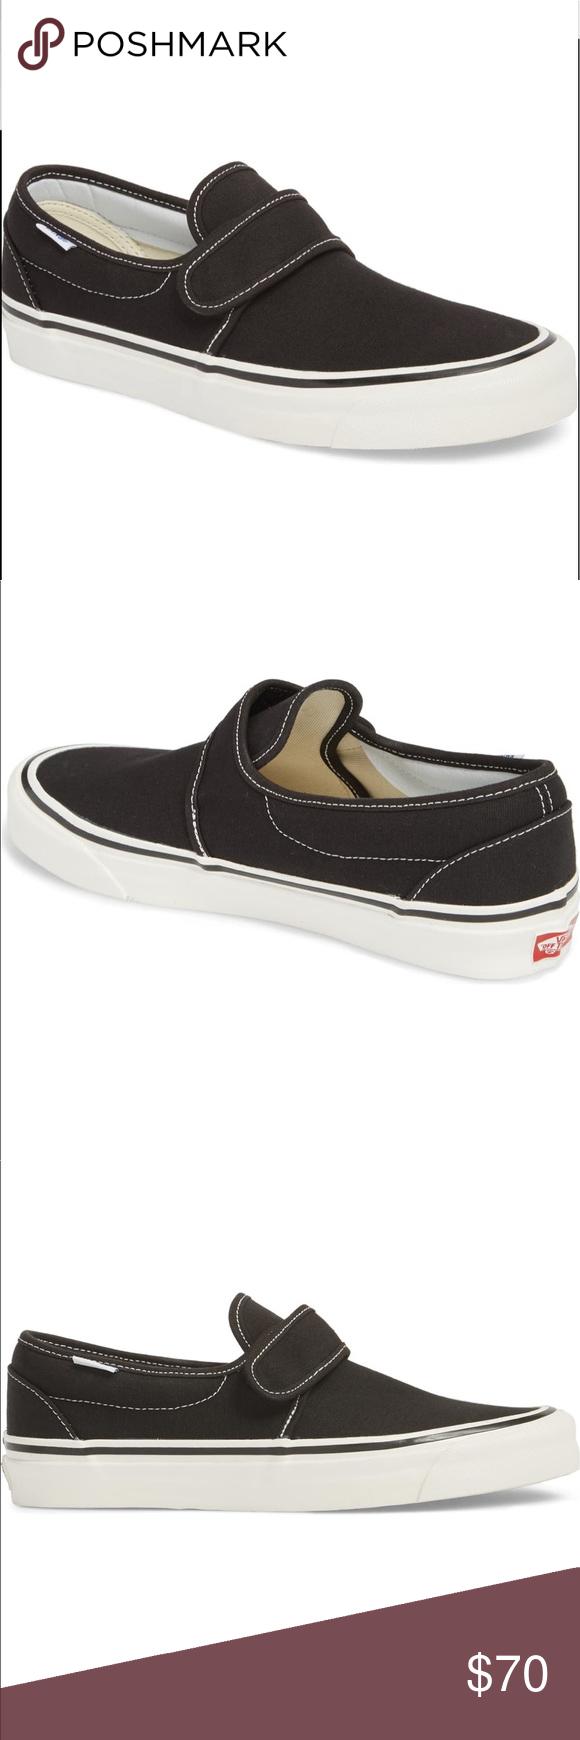 Vans Black SlipOns with Velcro Strap Vans Black SlipOns